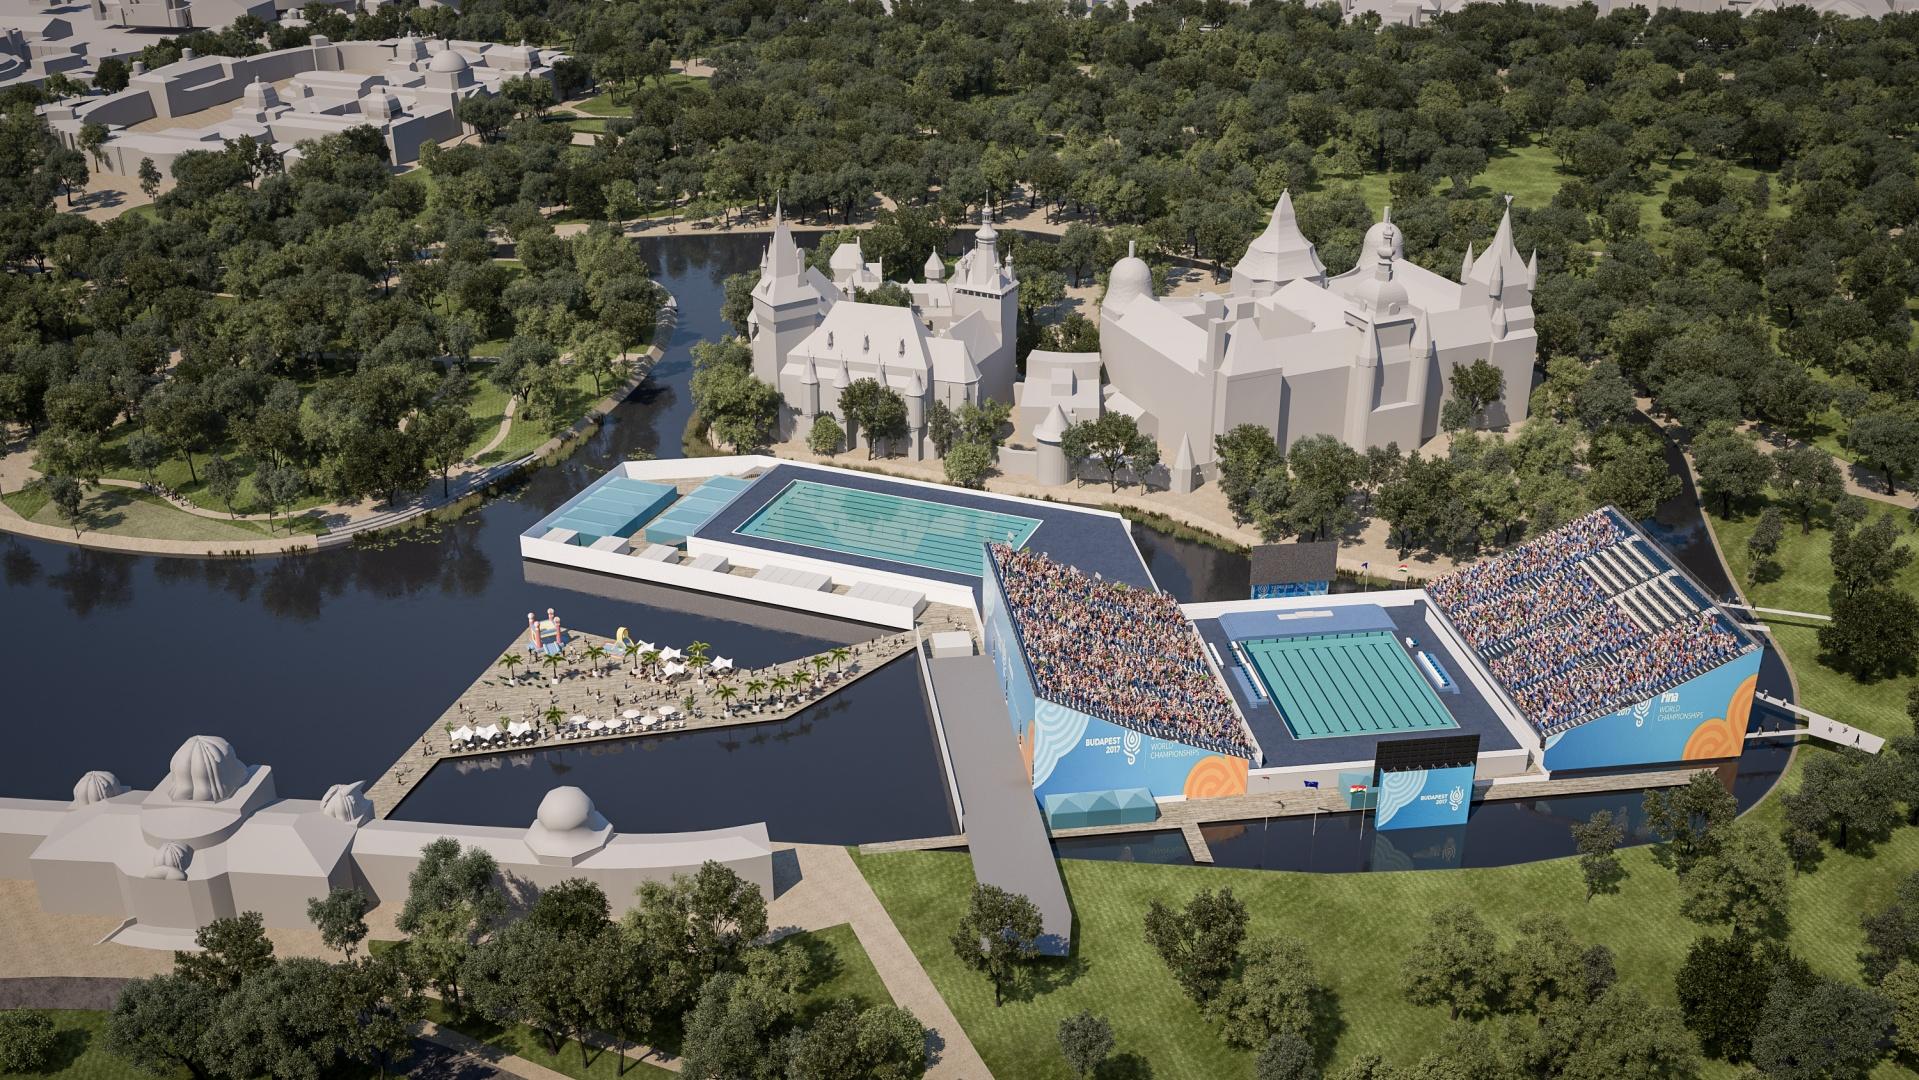 50 millióval drágul a Liget projekt vizes vébé miatt